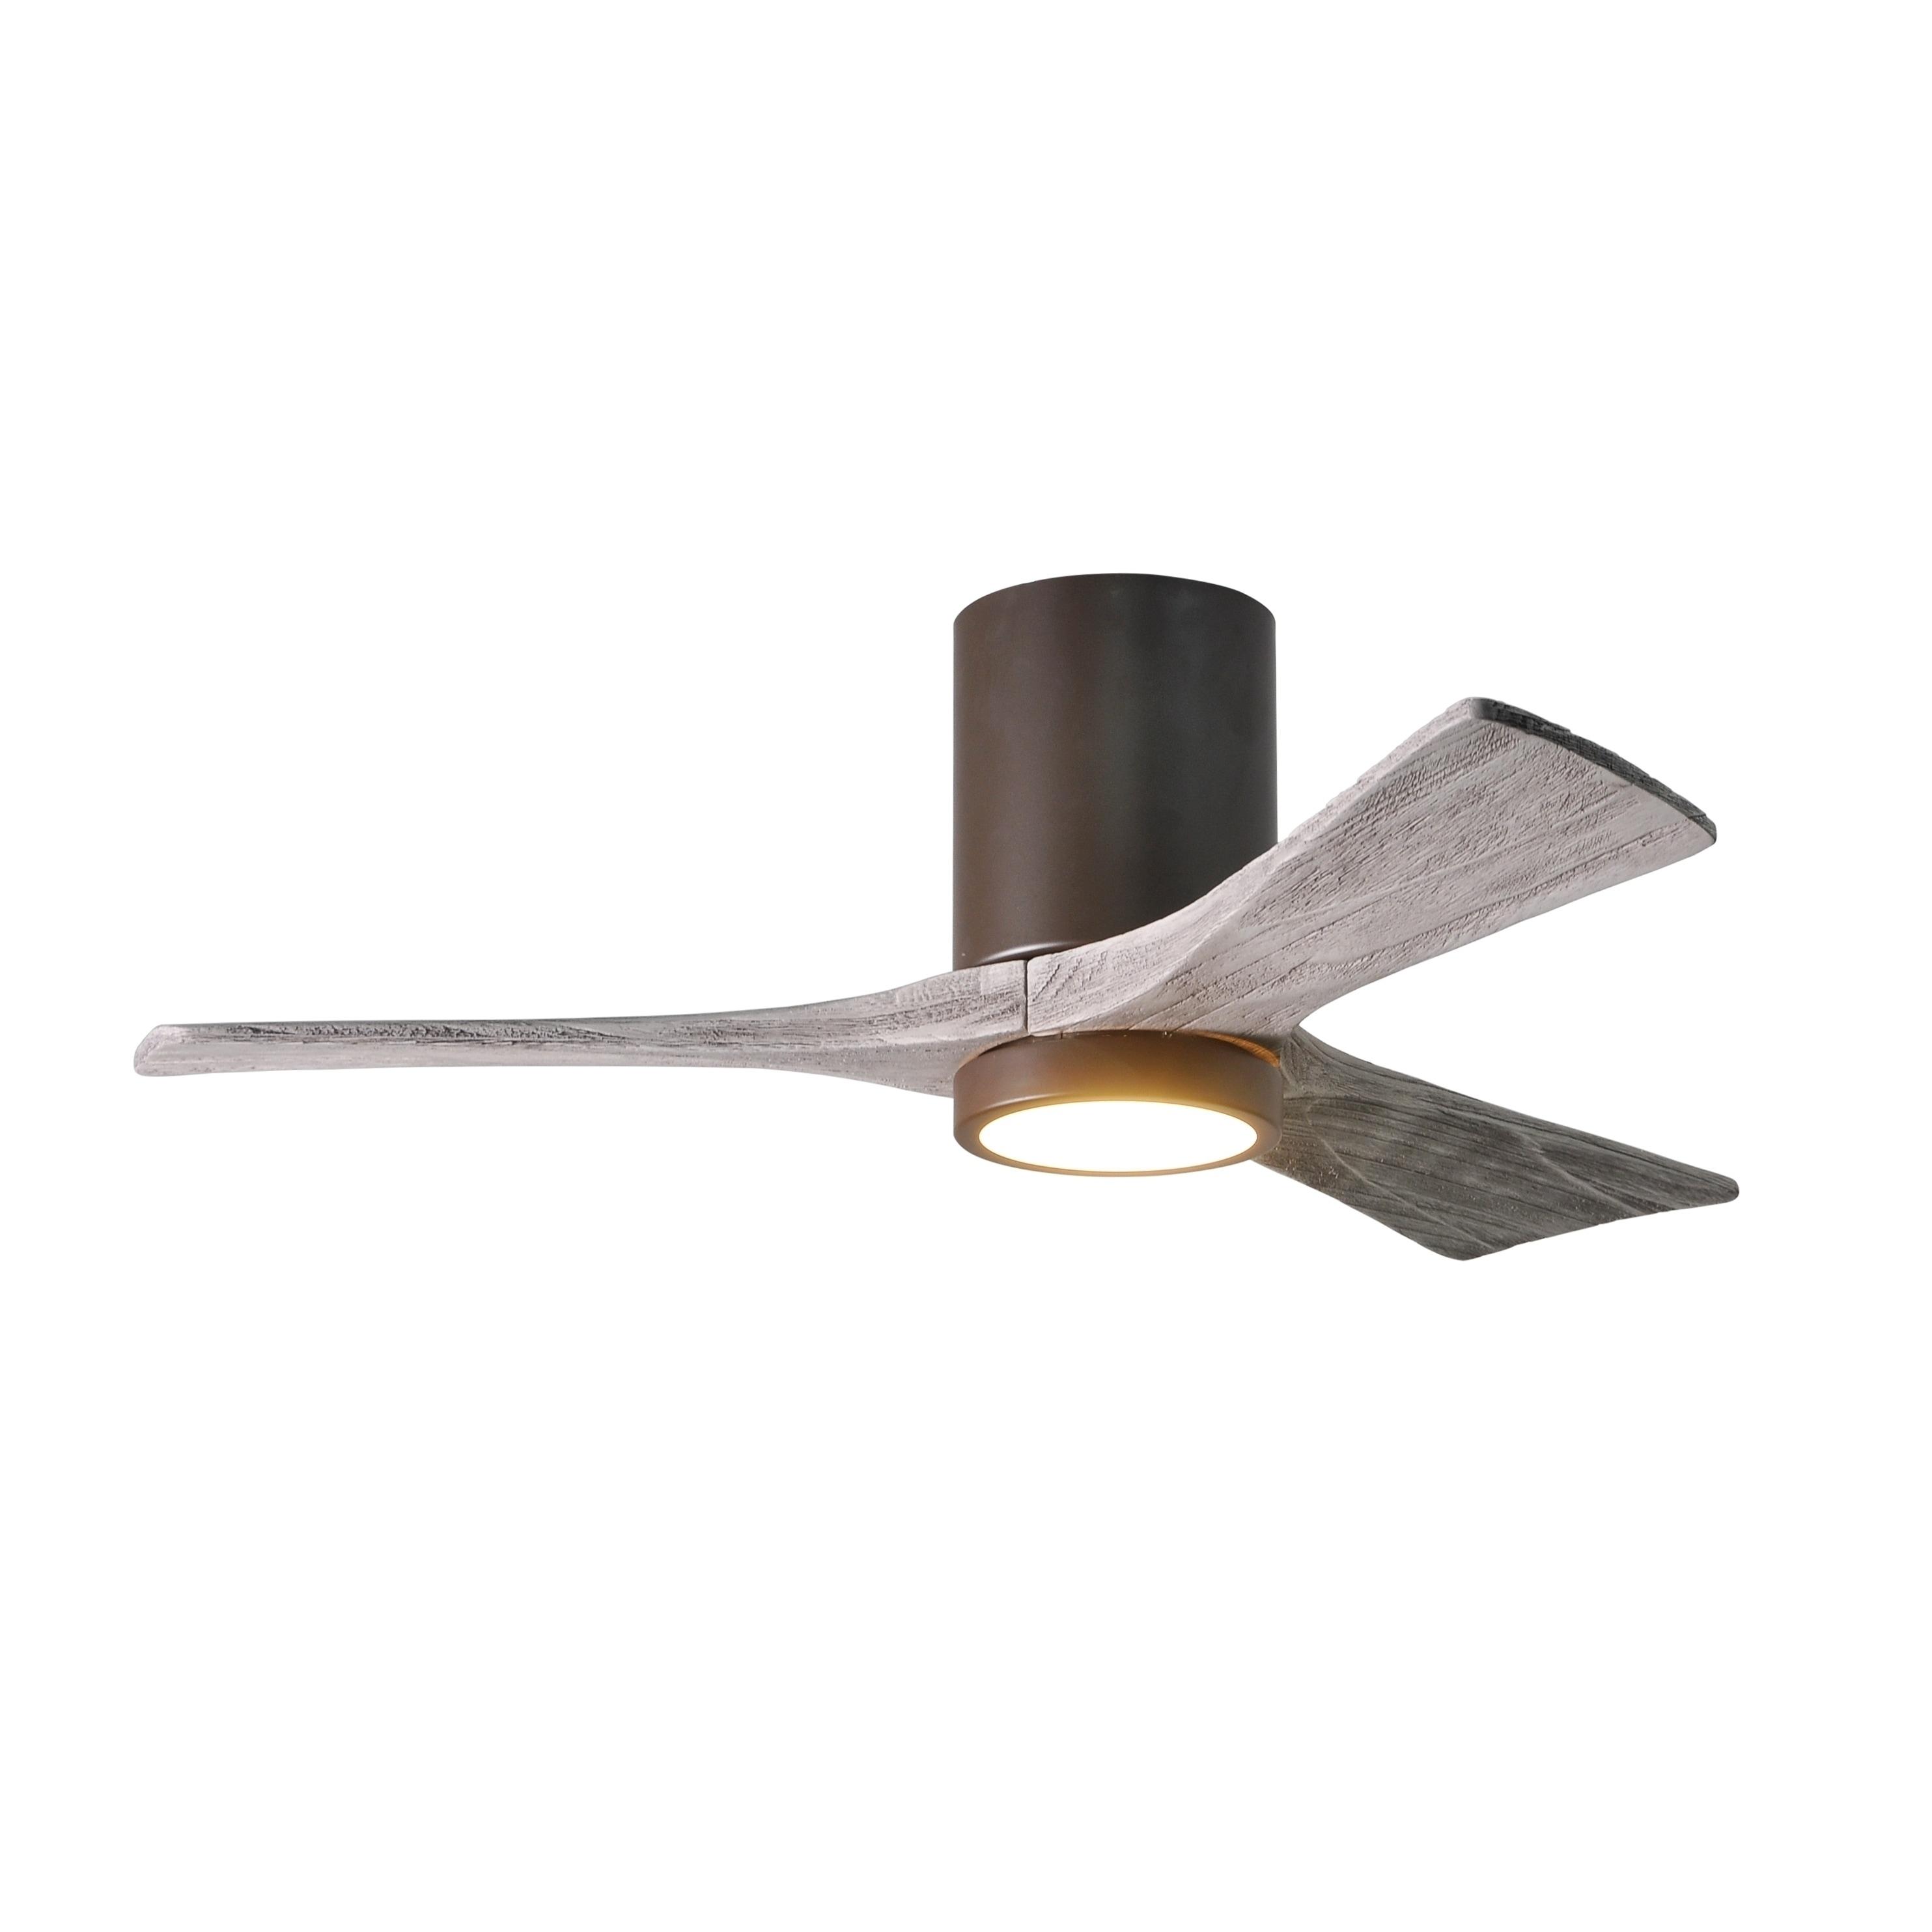 Shop Matthews Fan pany Irene HLK 3 blade 42 inch Textured Bronze